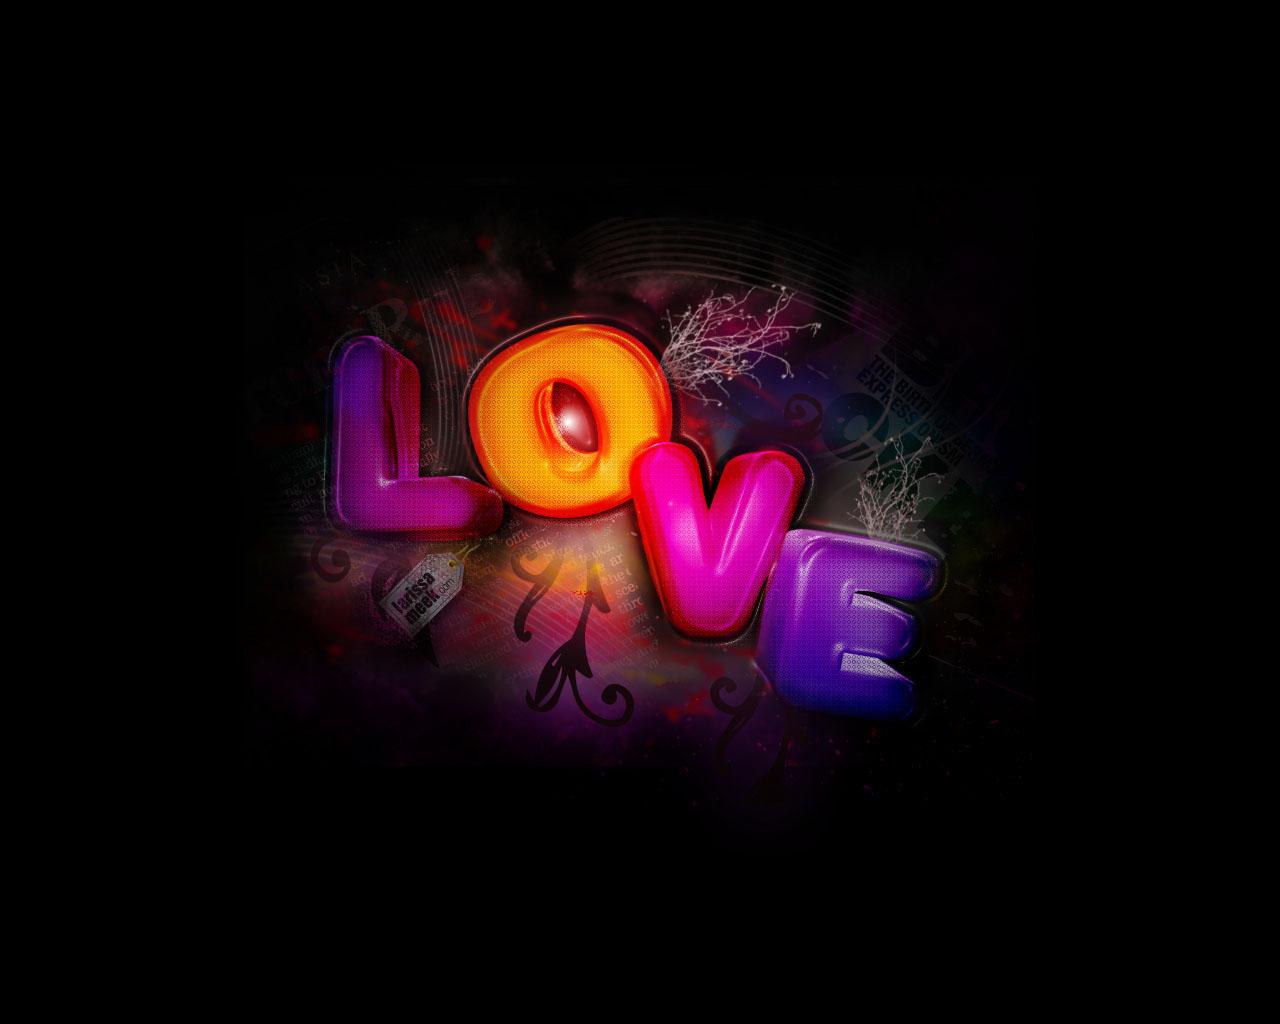 Zwarte Achtergrond Met Gekleurde Love Letters